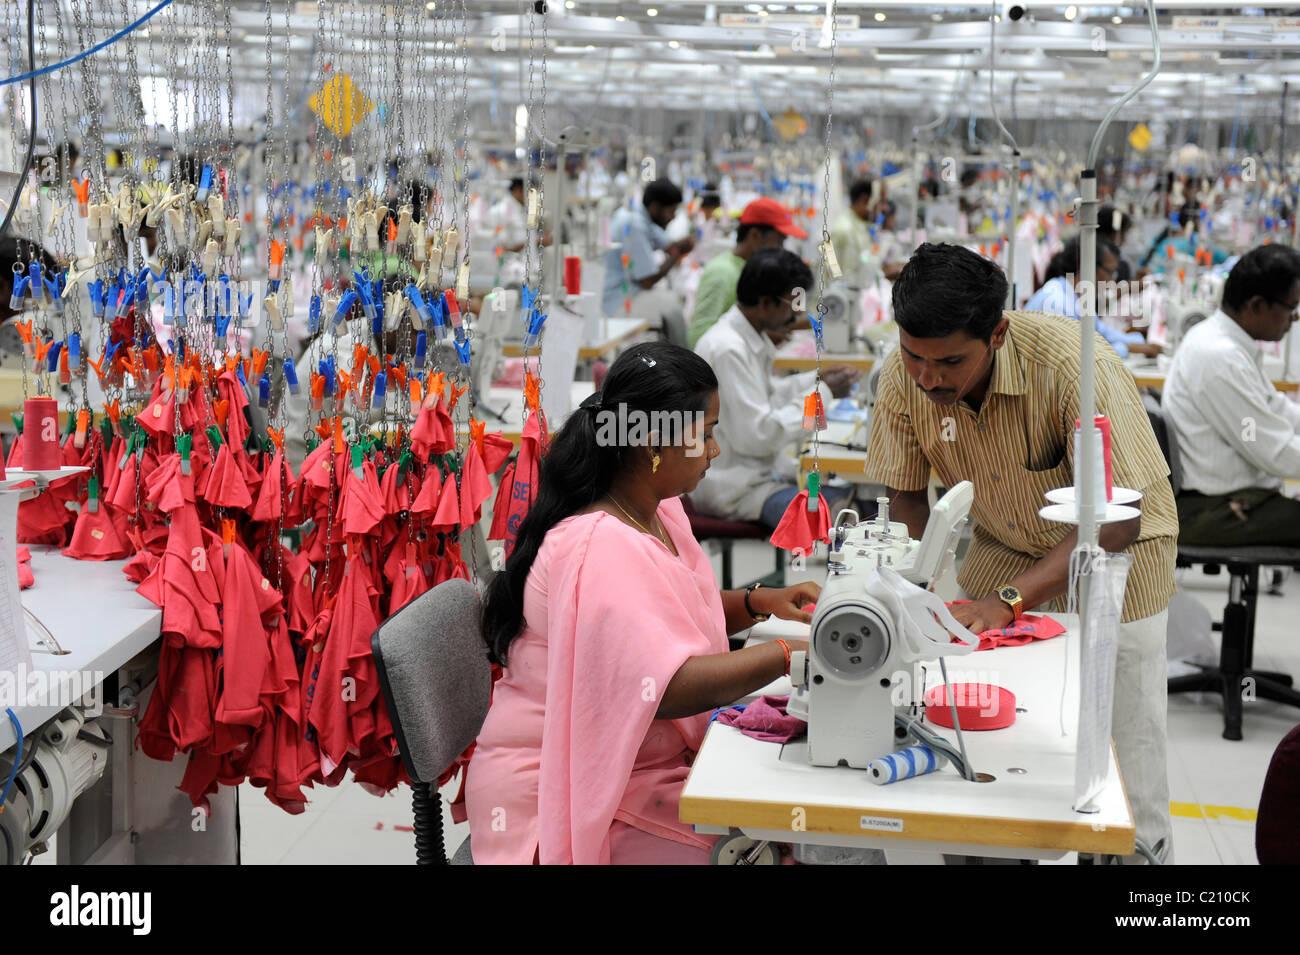 India Tamil Nadu Tirupur Women Work In Fair Trade Textile Stock Photo Royalty Free Image